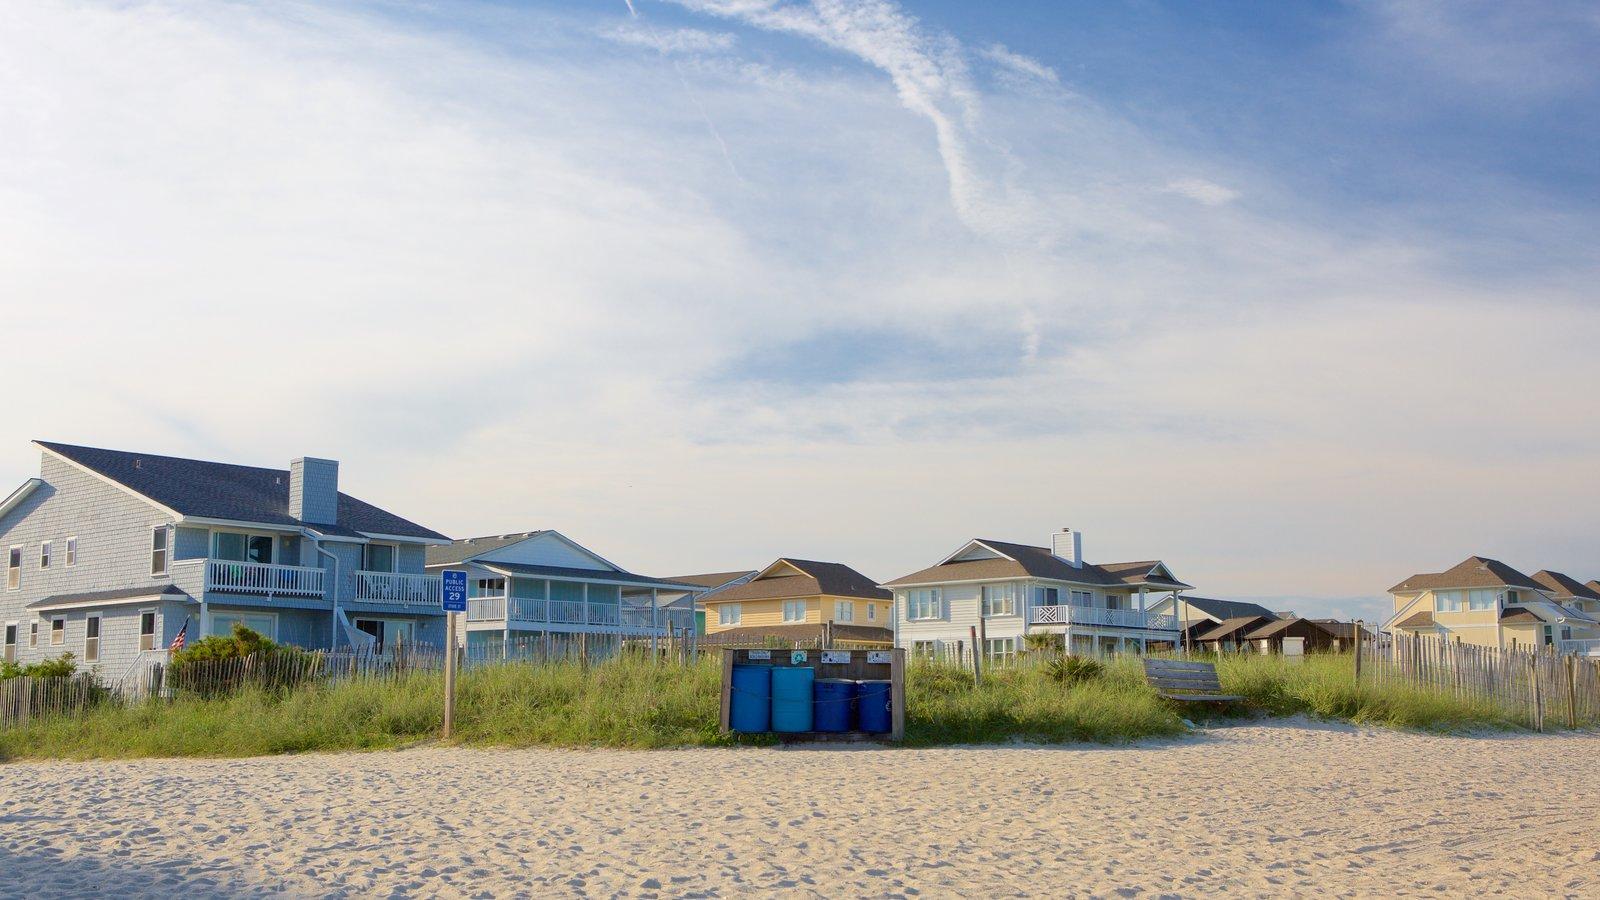 Wrightsville Beach which includes general coastal views, a beach and a house